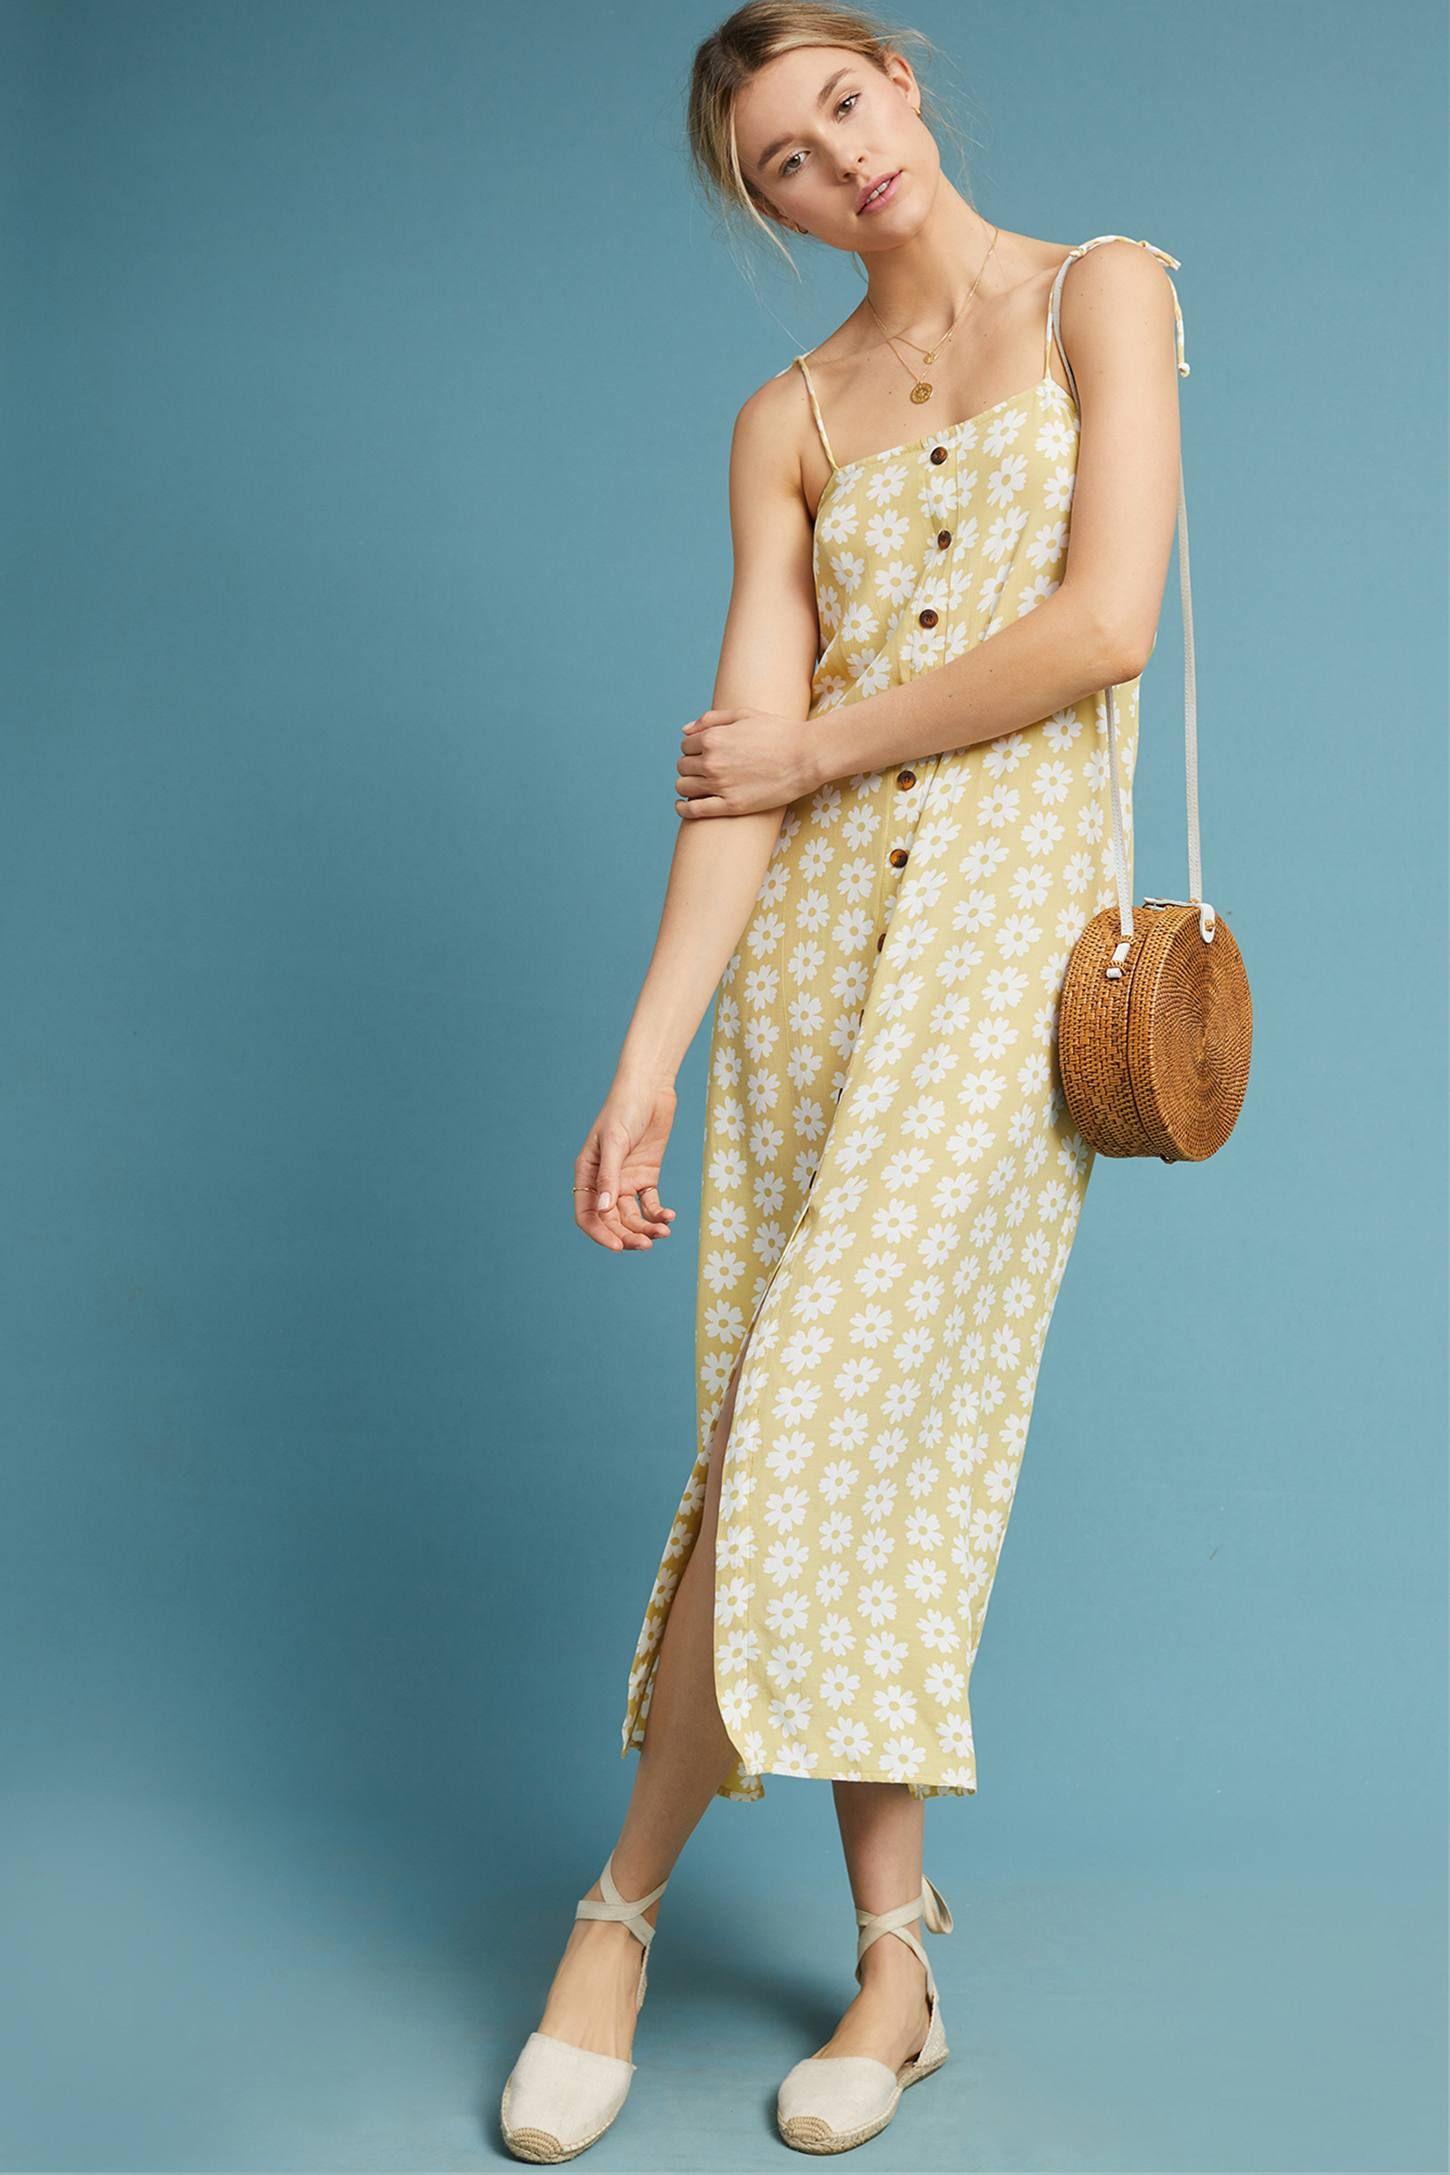 30db63a81dca Faithfull Daisy Midi Dress